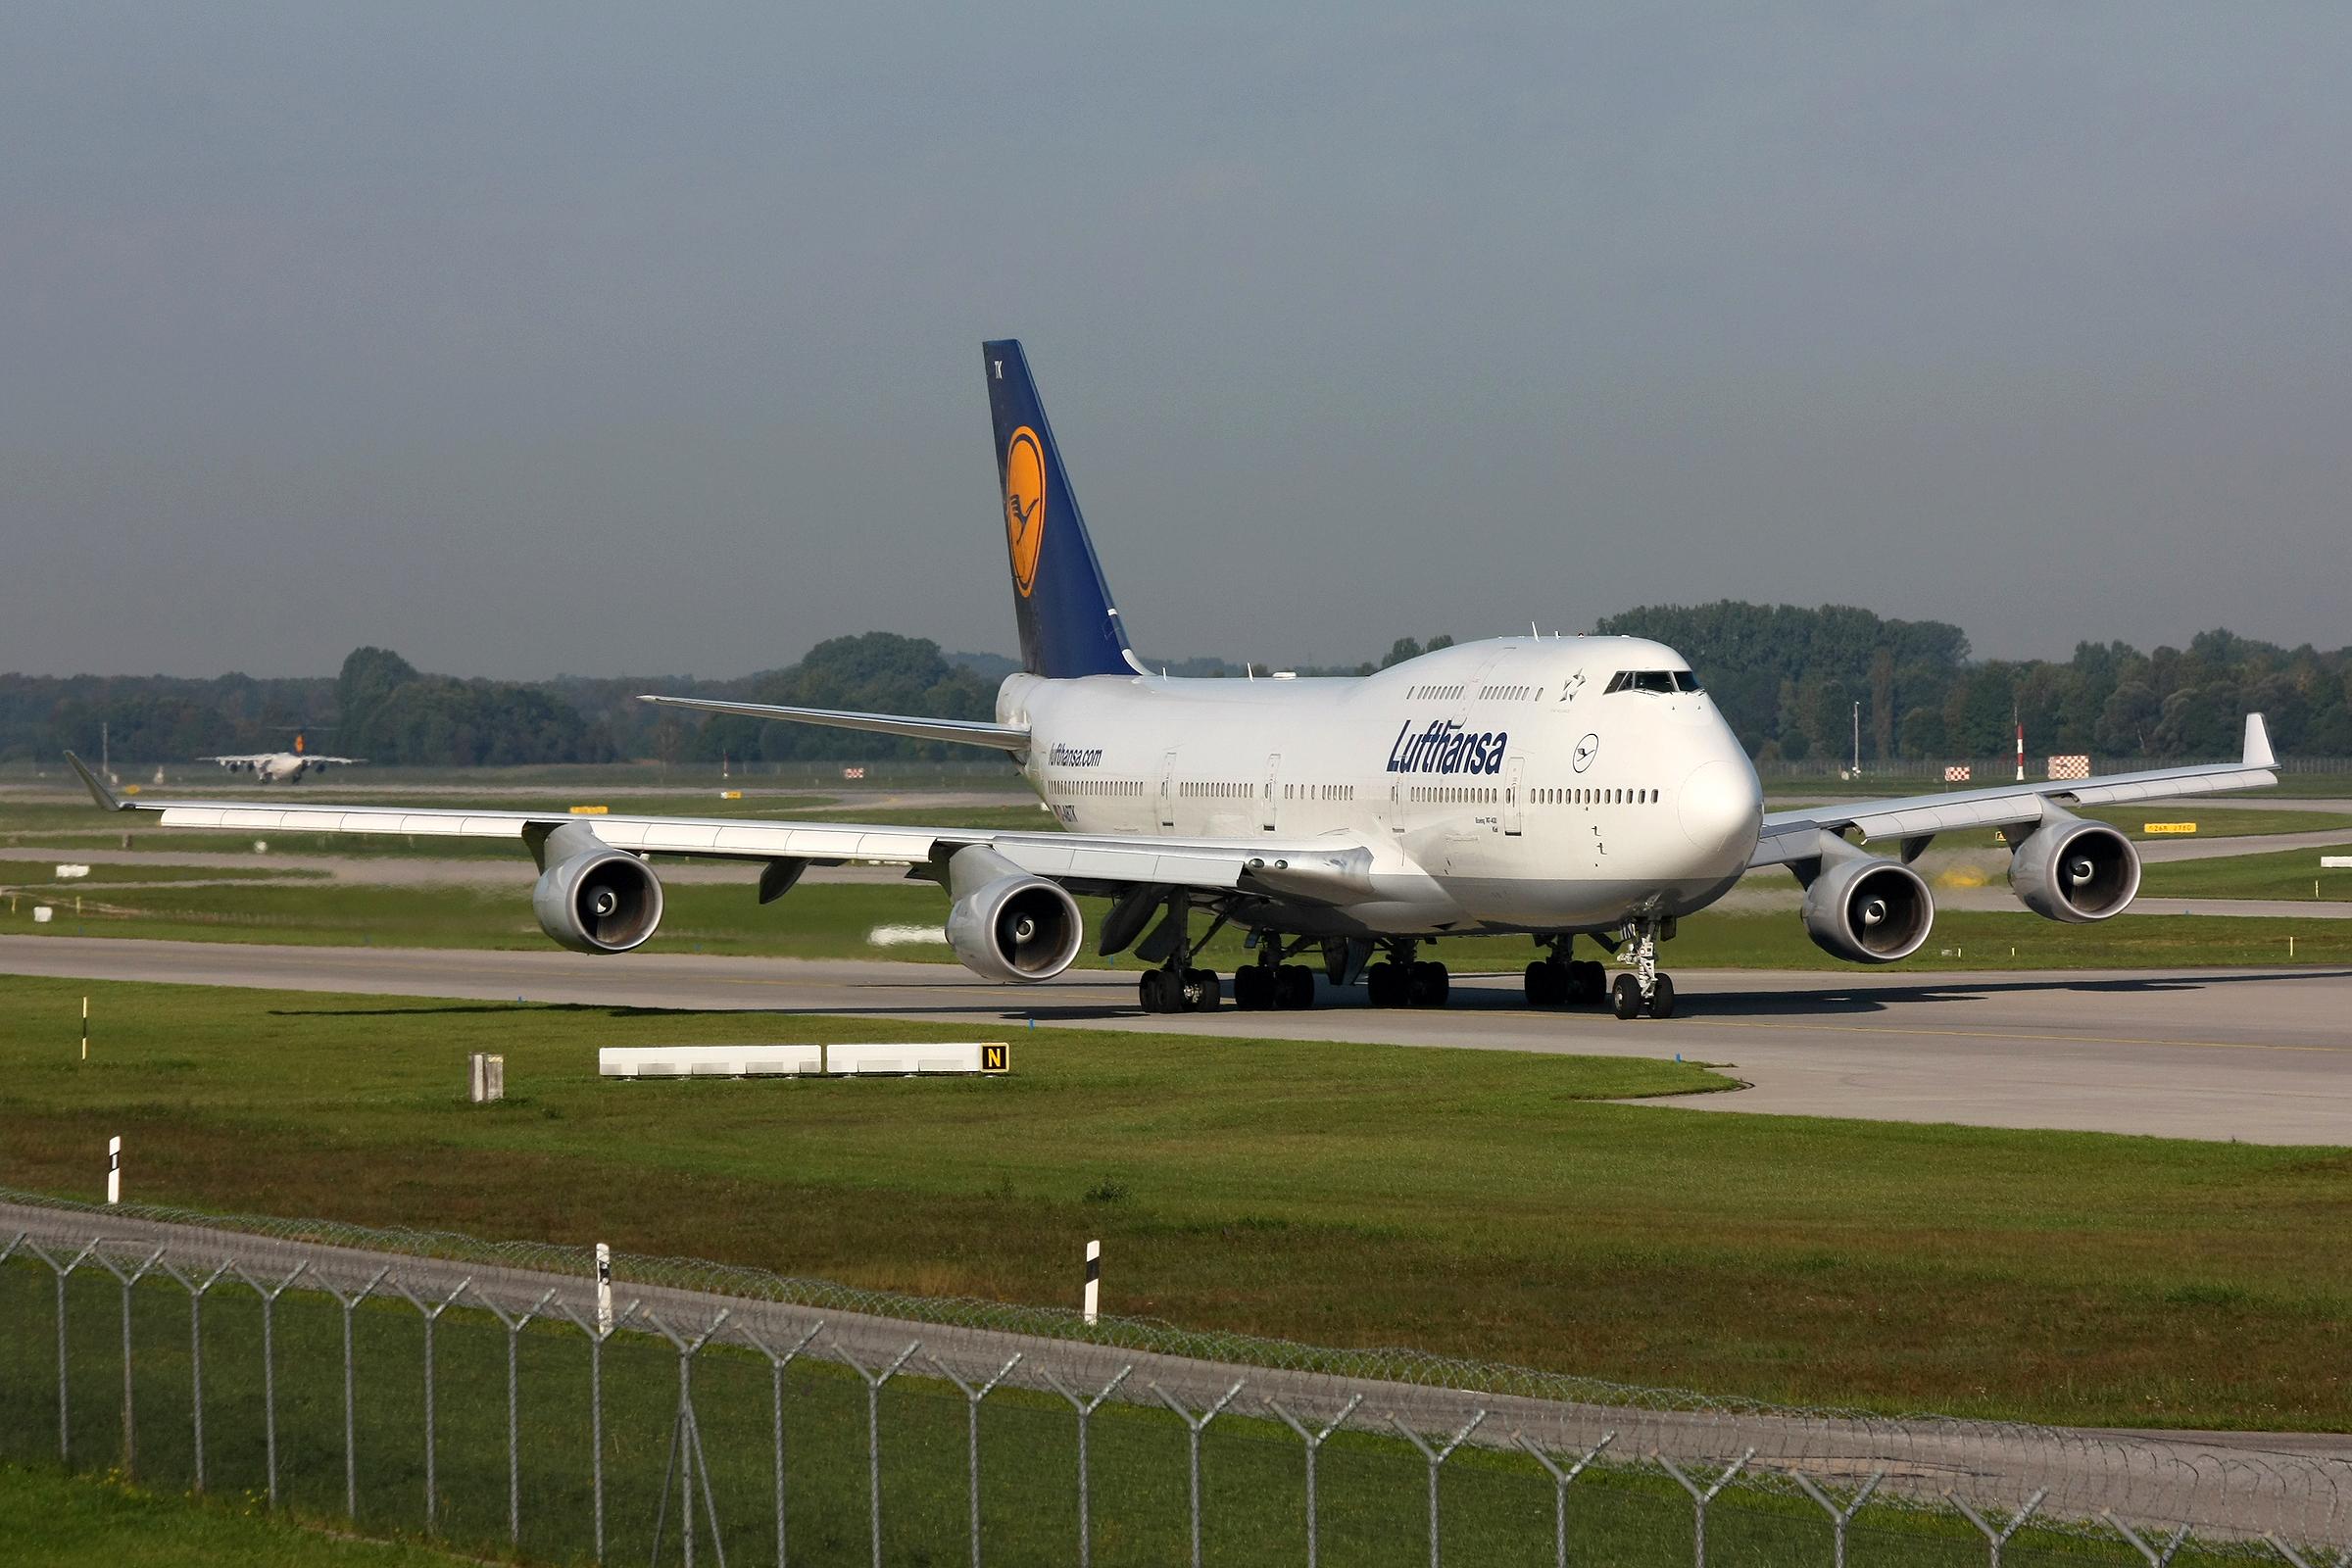 File:Lufthansa 744 D-ABTK-1.jpg